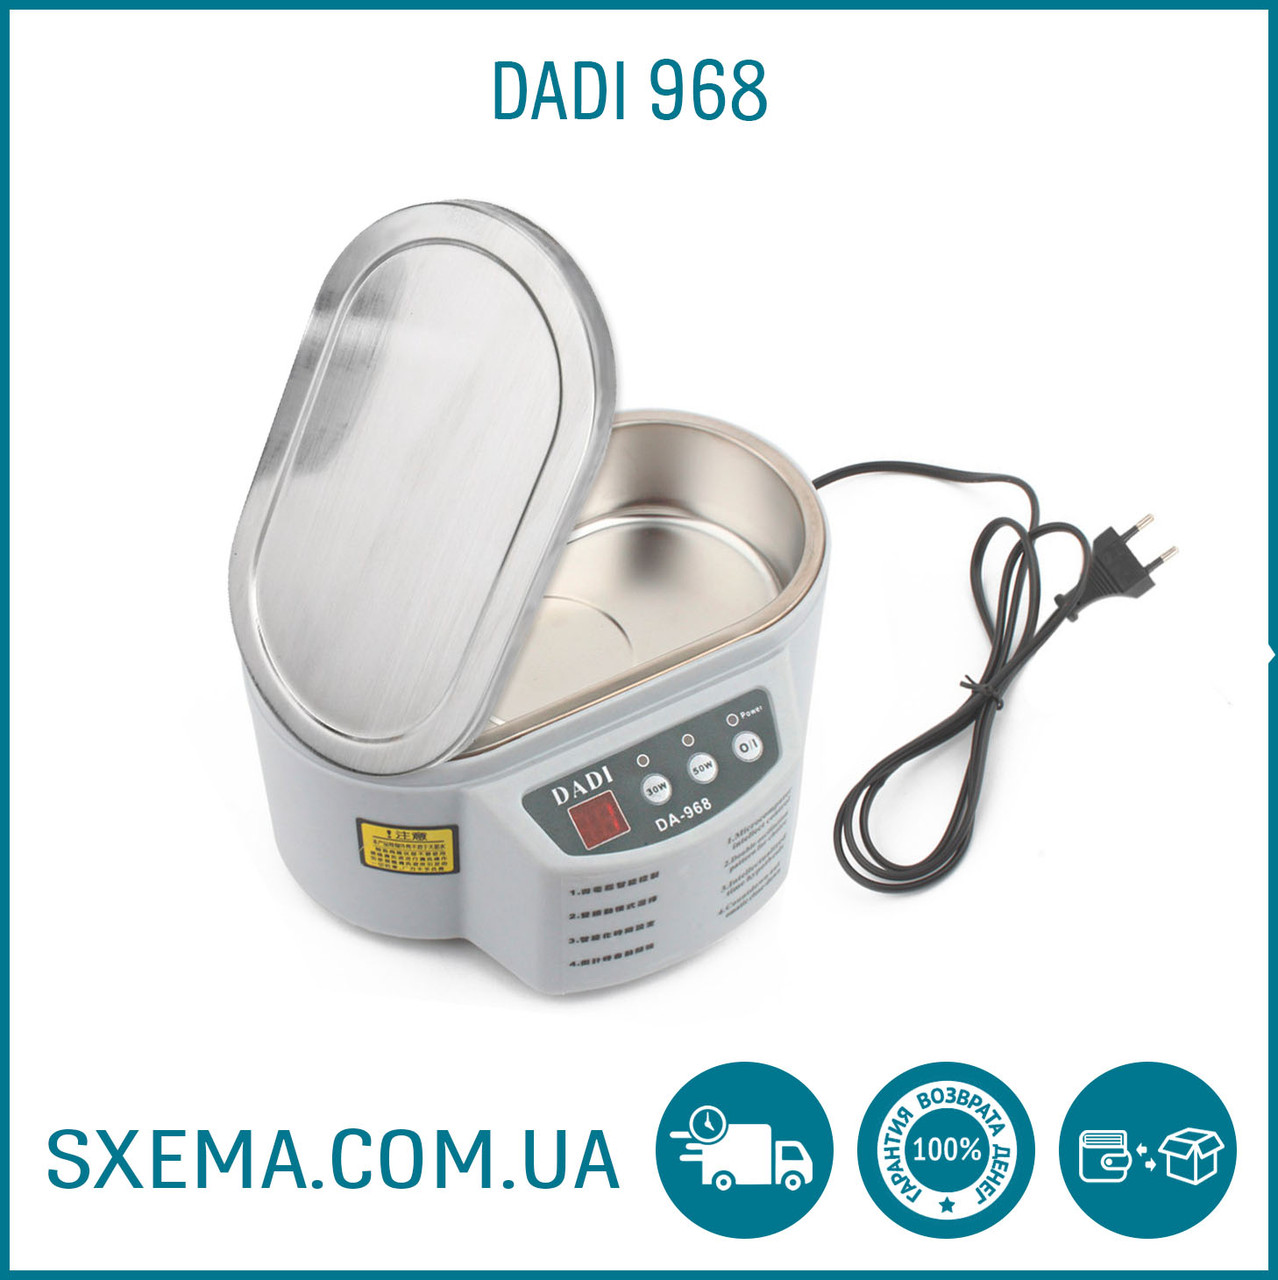 Ультразвуковая ванна DADI 968 два режима работы 30W/50W